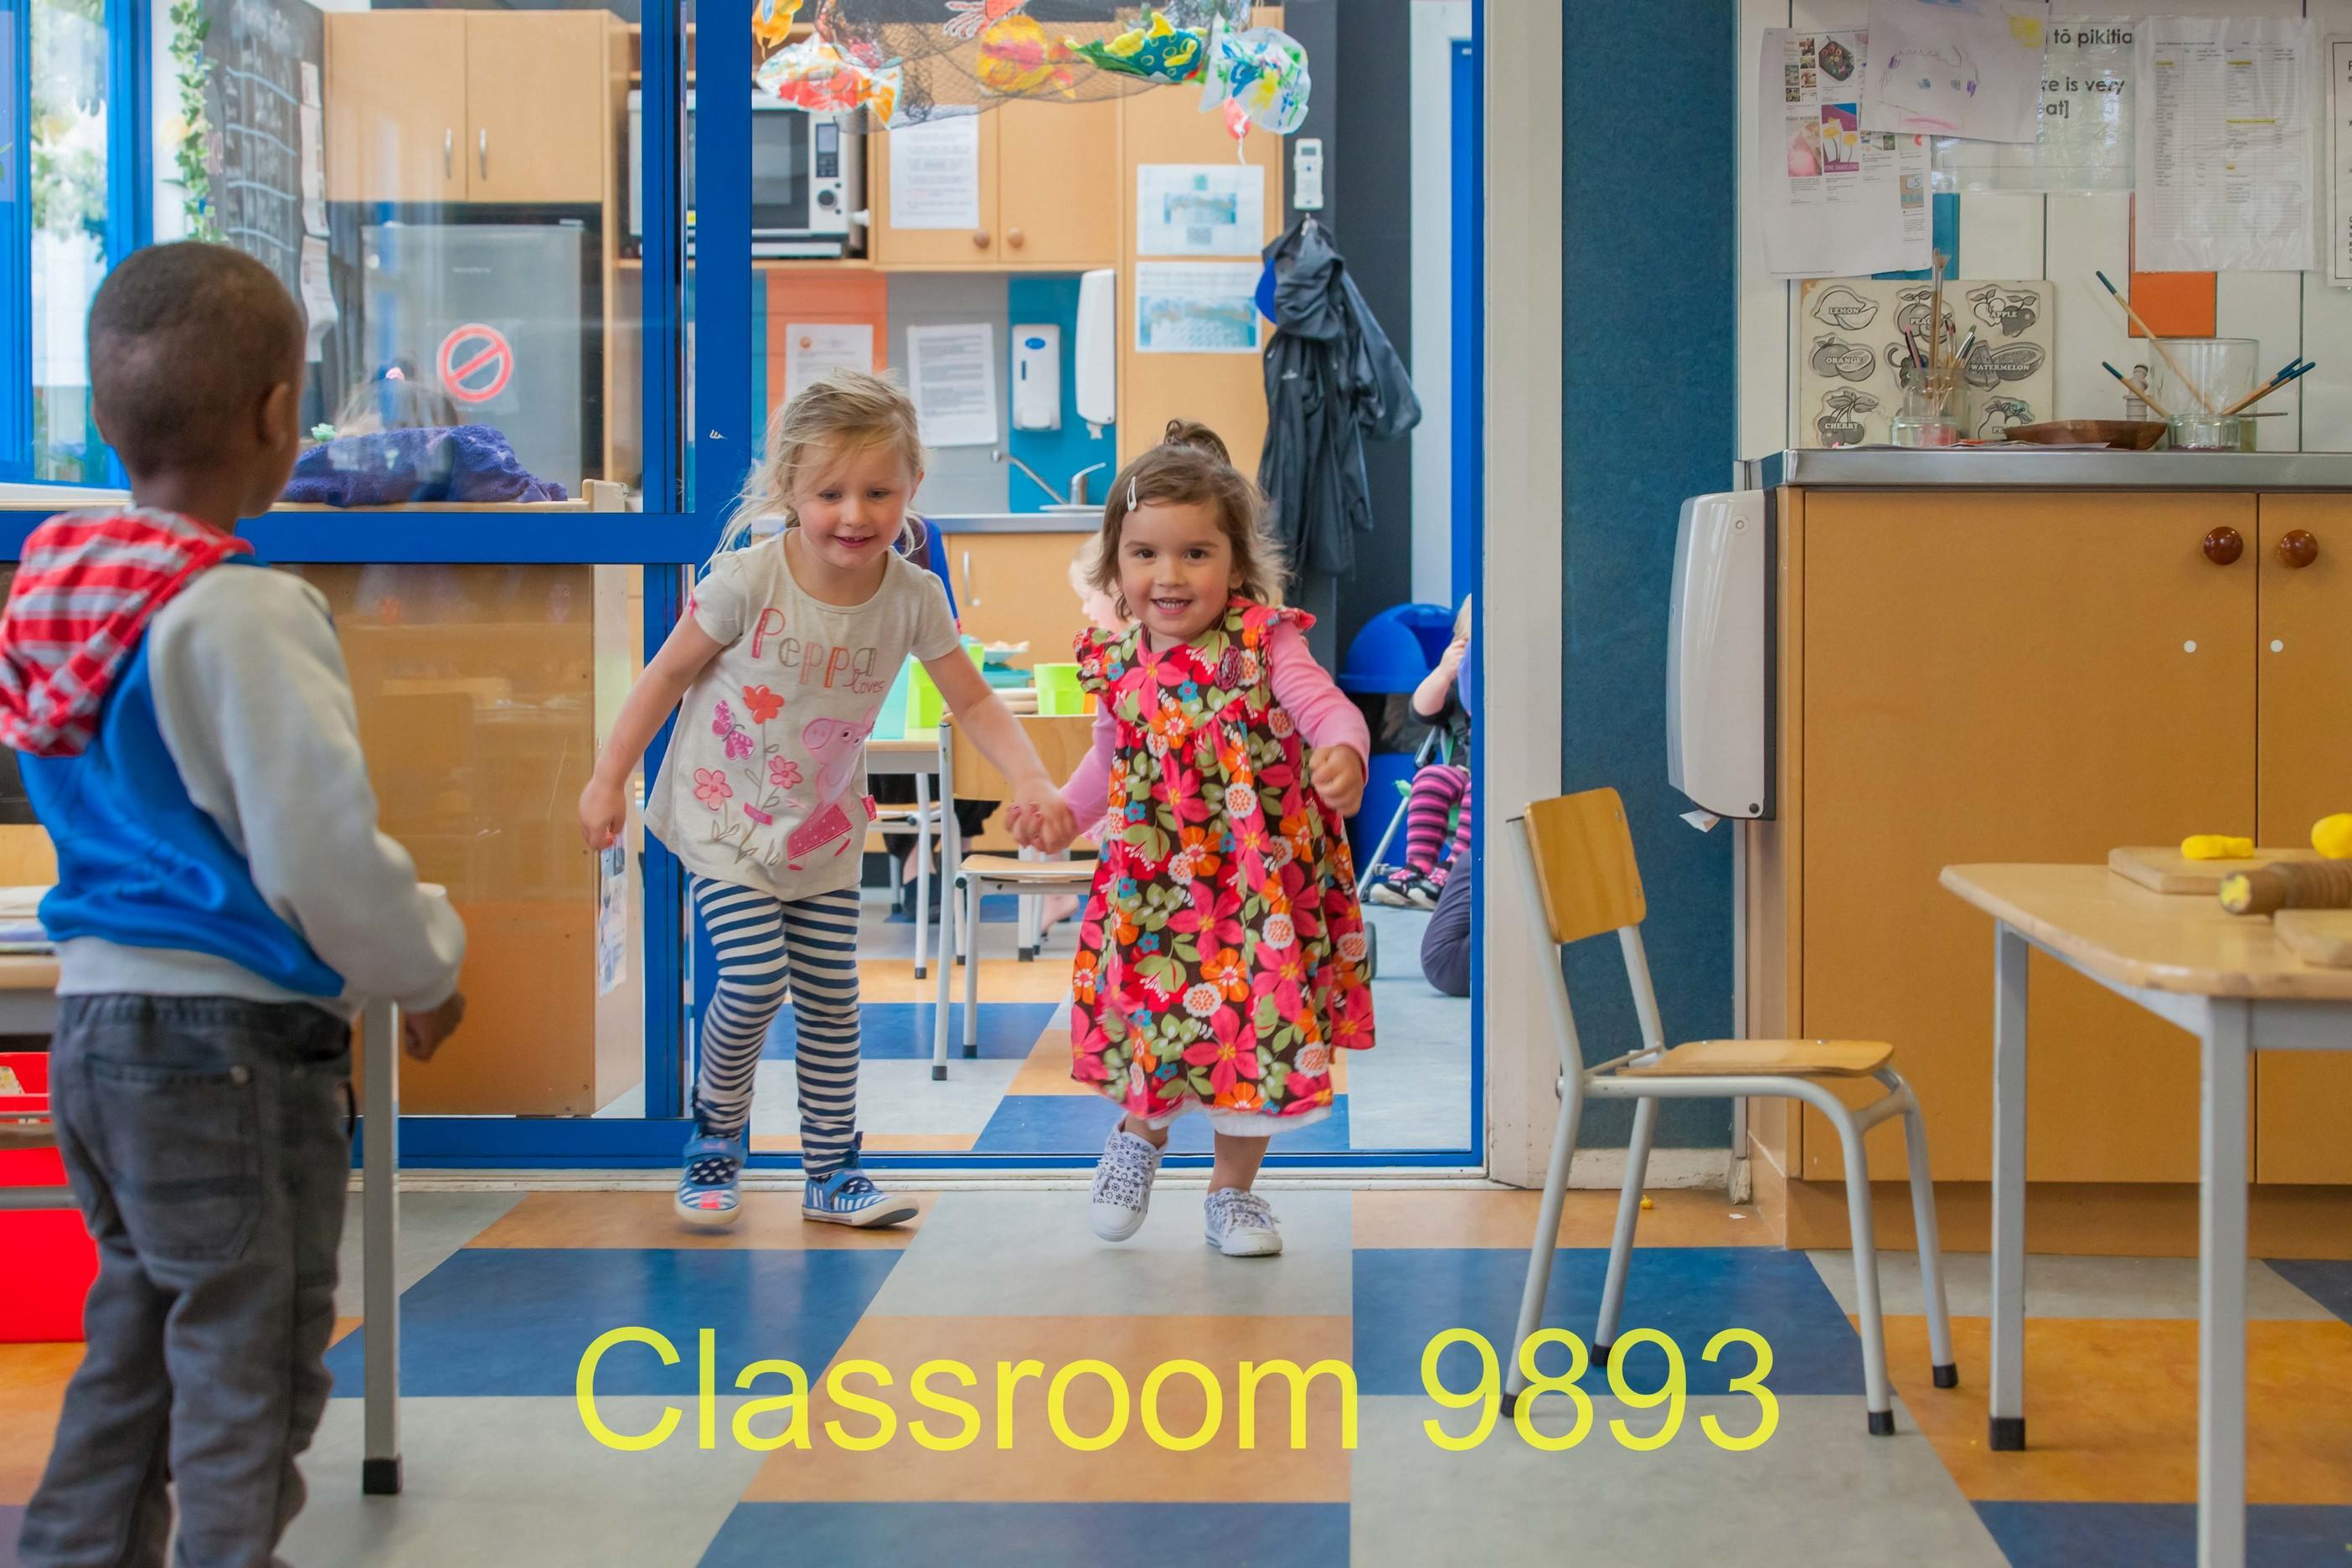 Classroom 9893